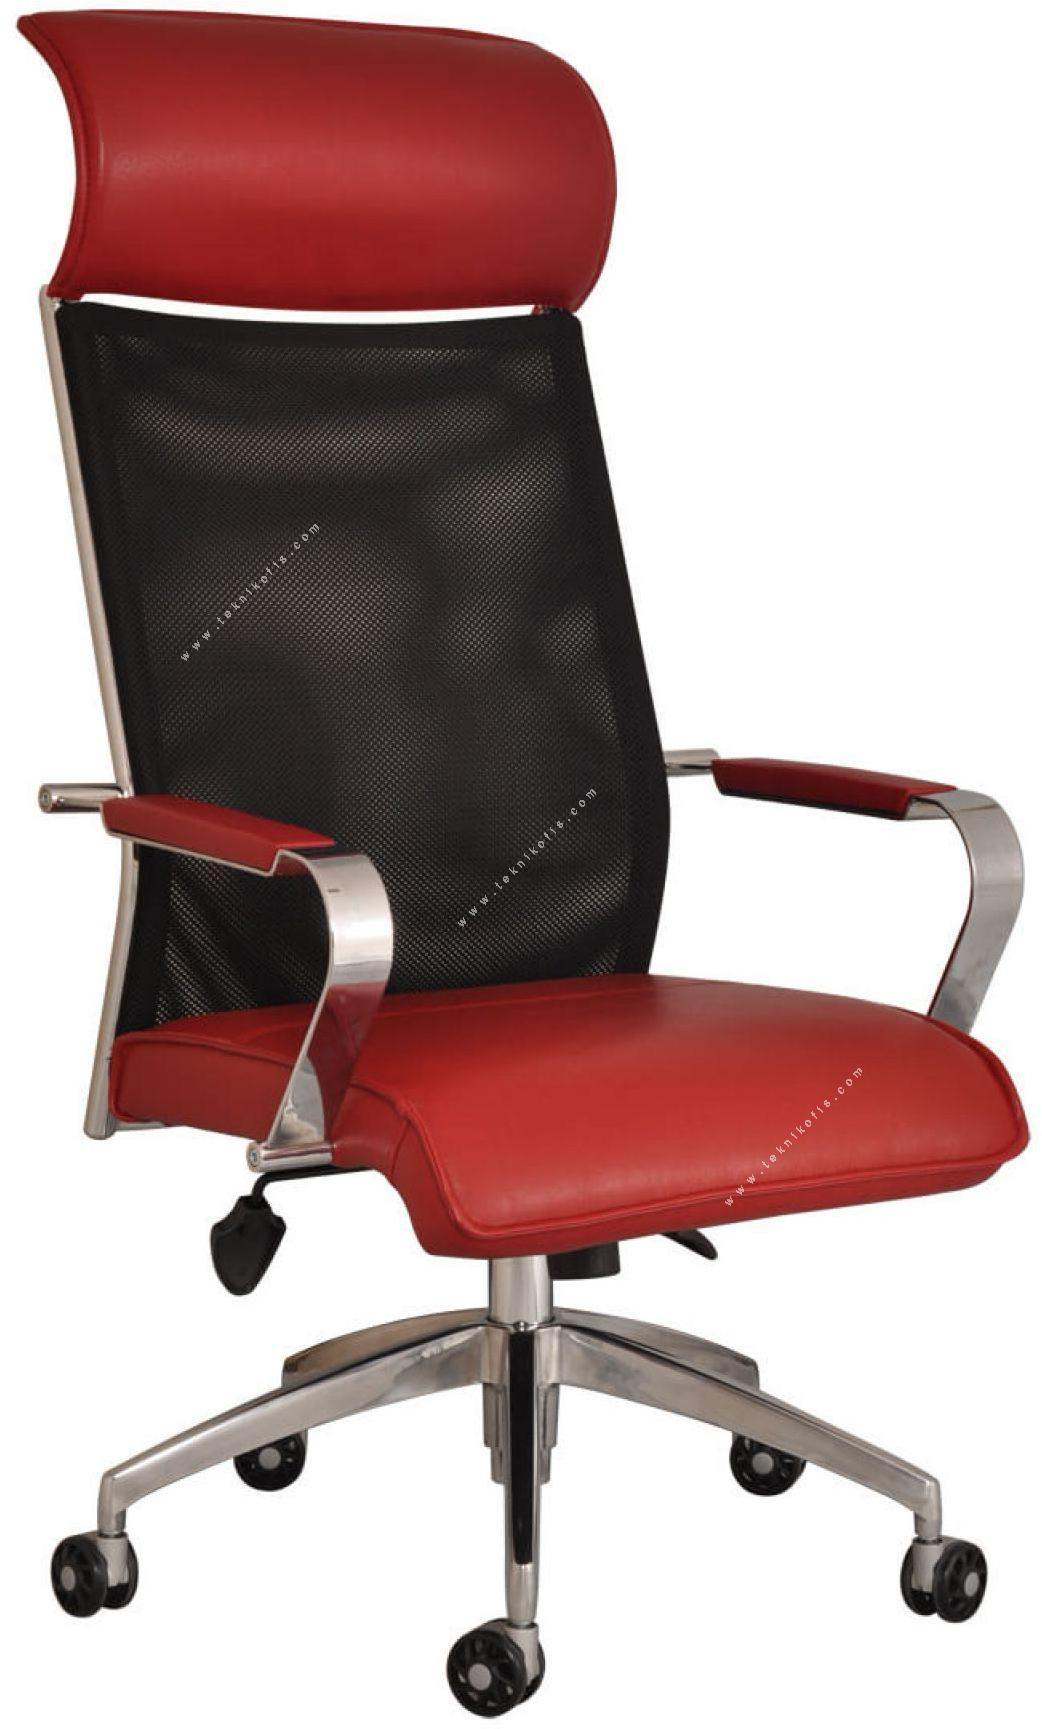 eva fileli yonetici koltugu 4002